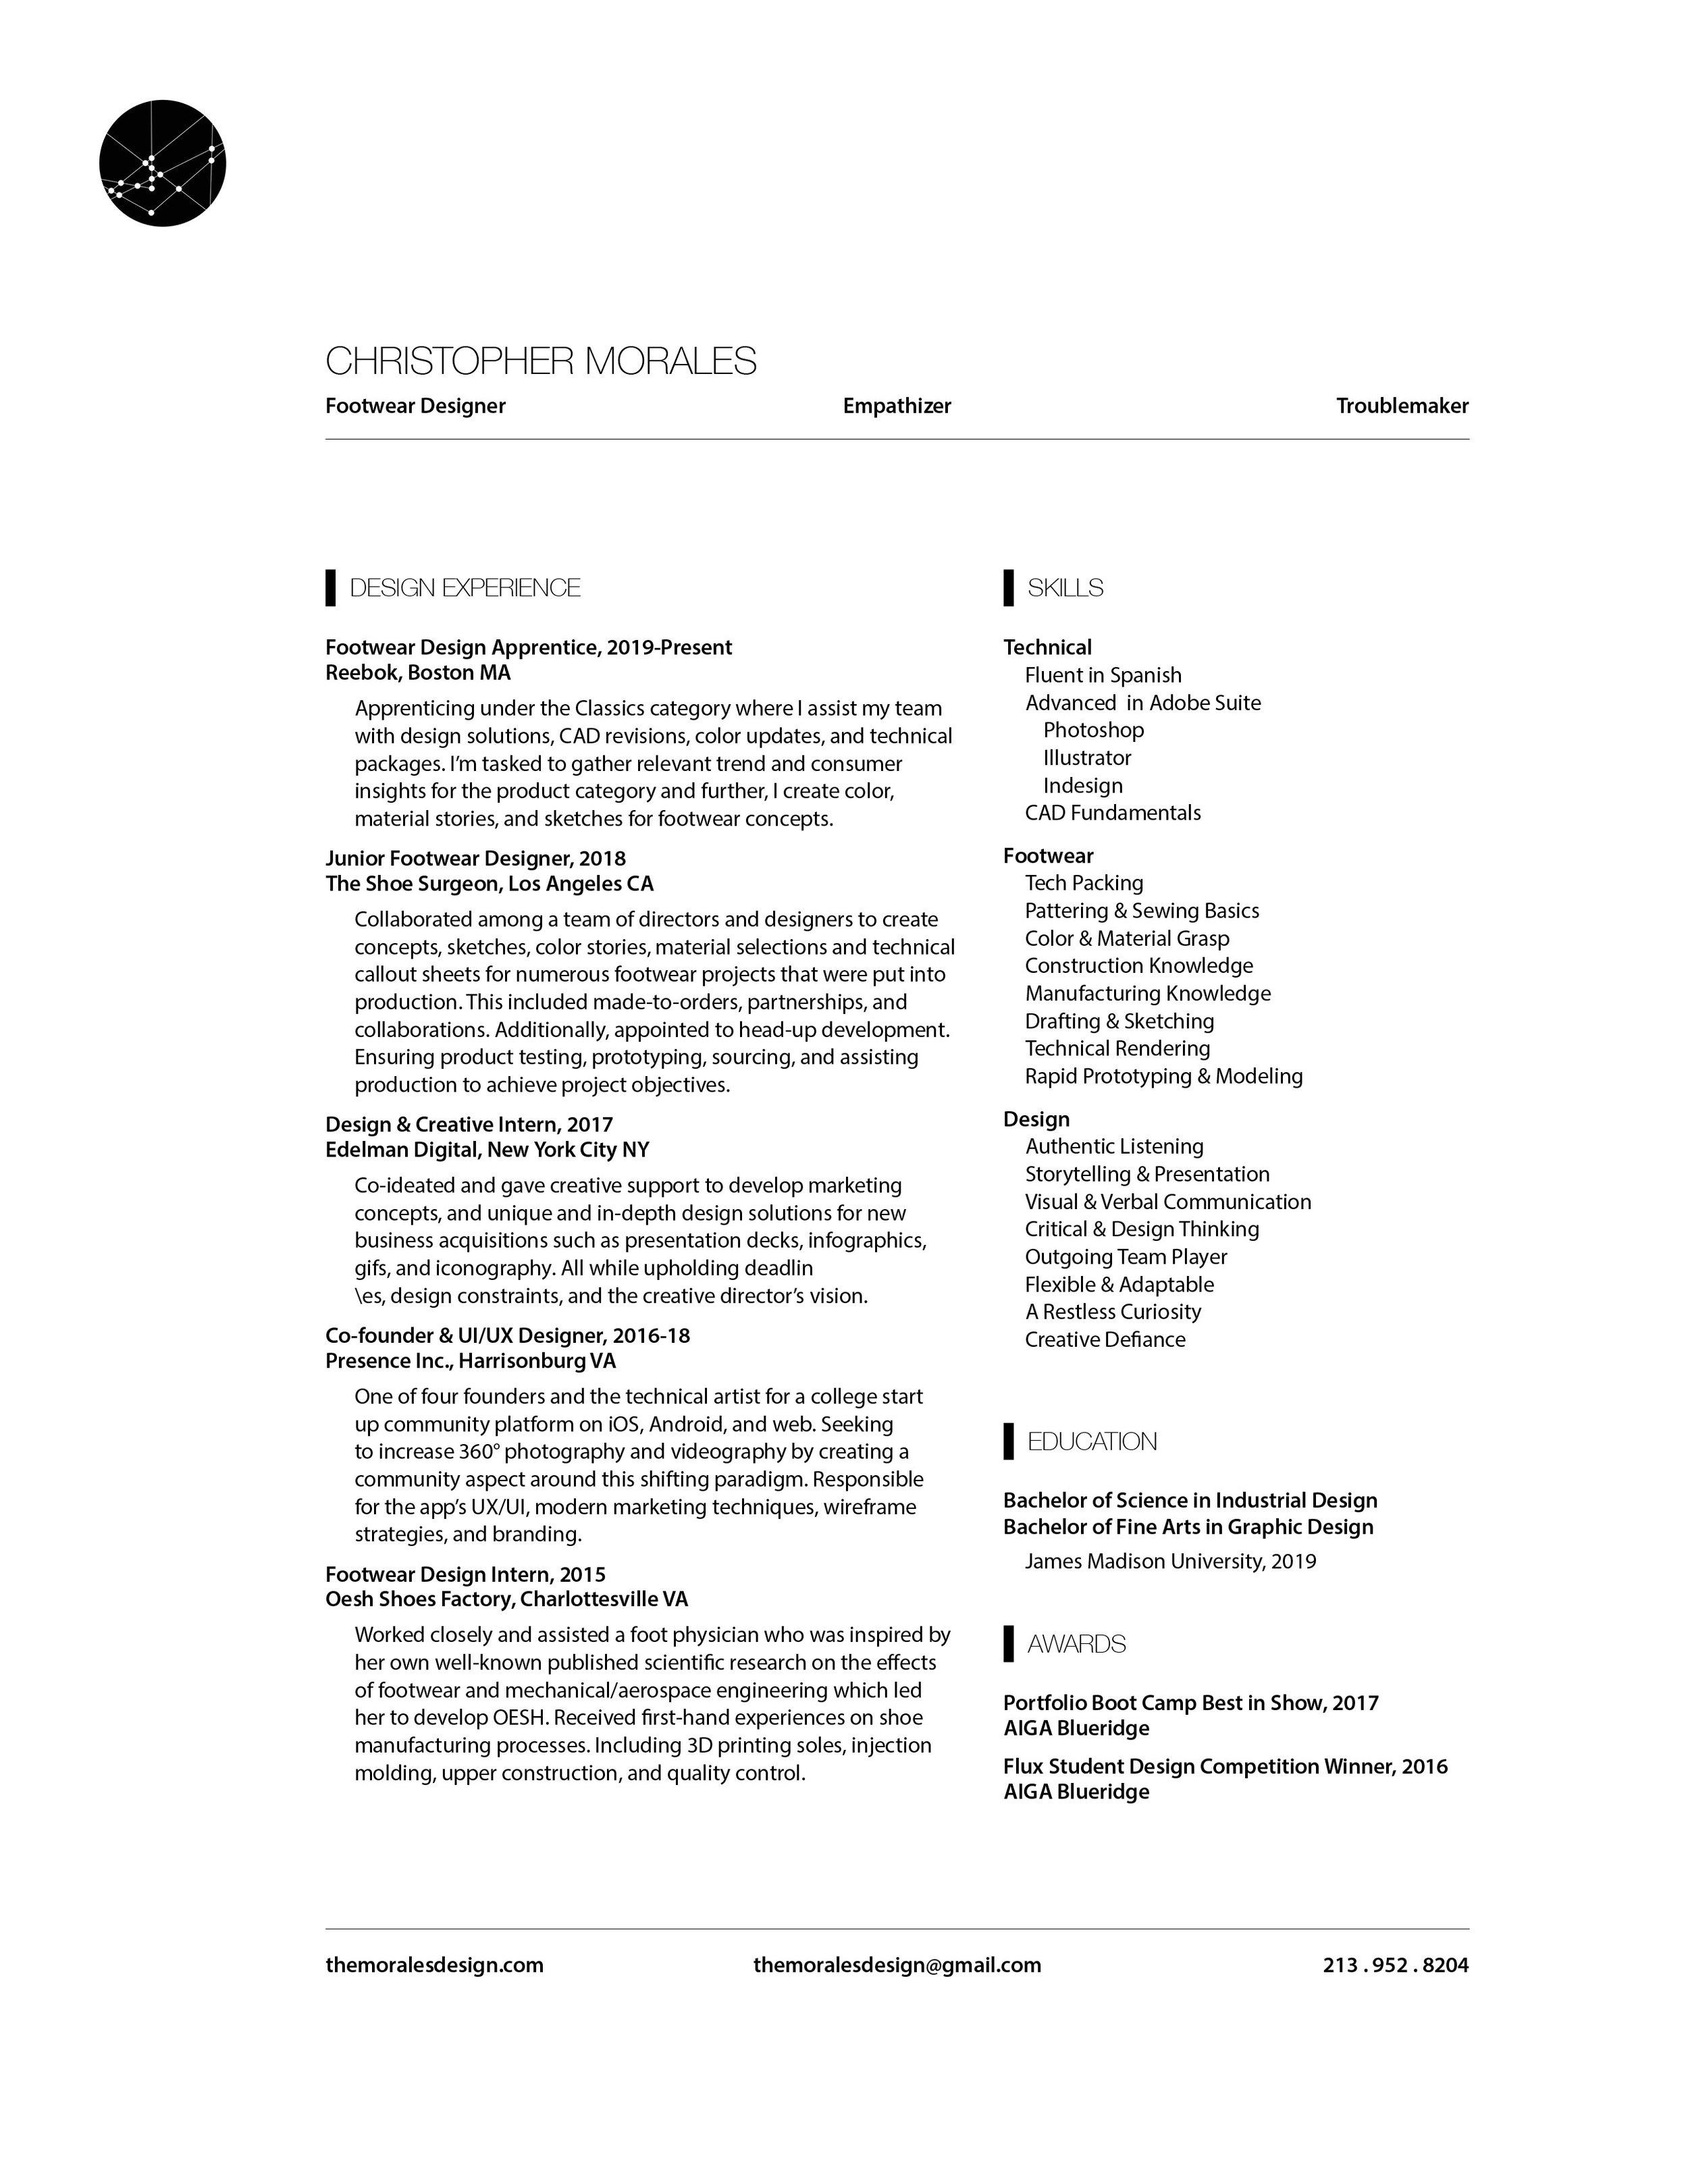 Christopher Morales - Resume - 05.07.19.jpg